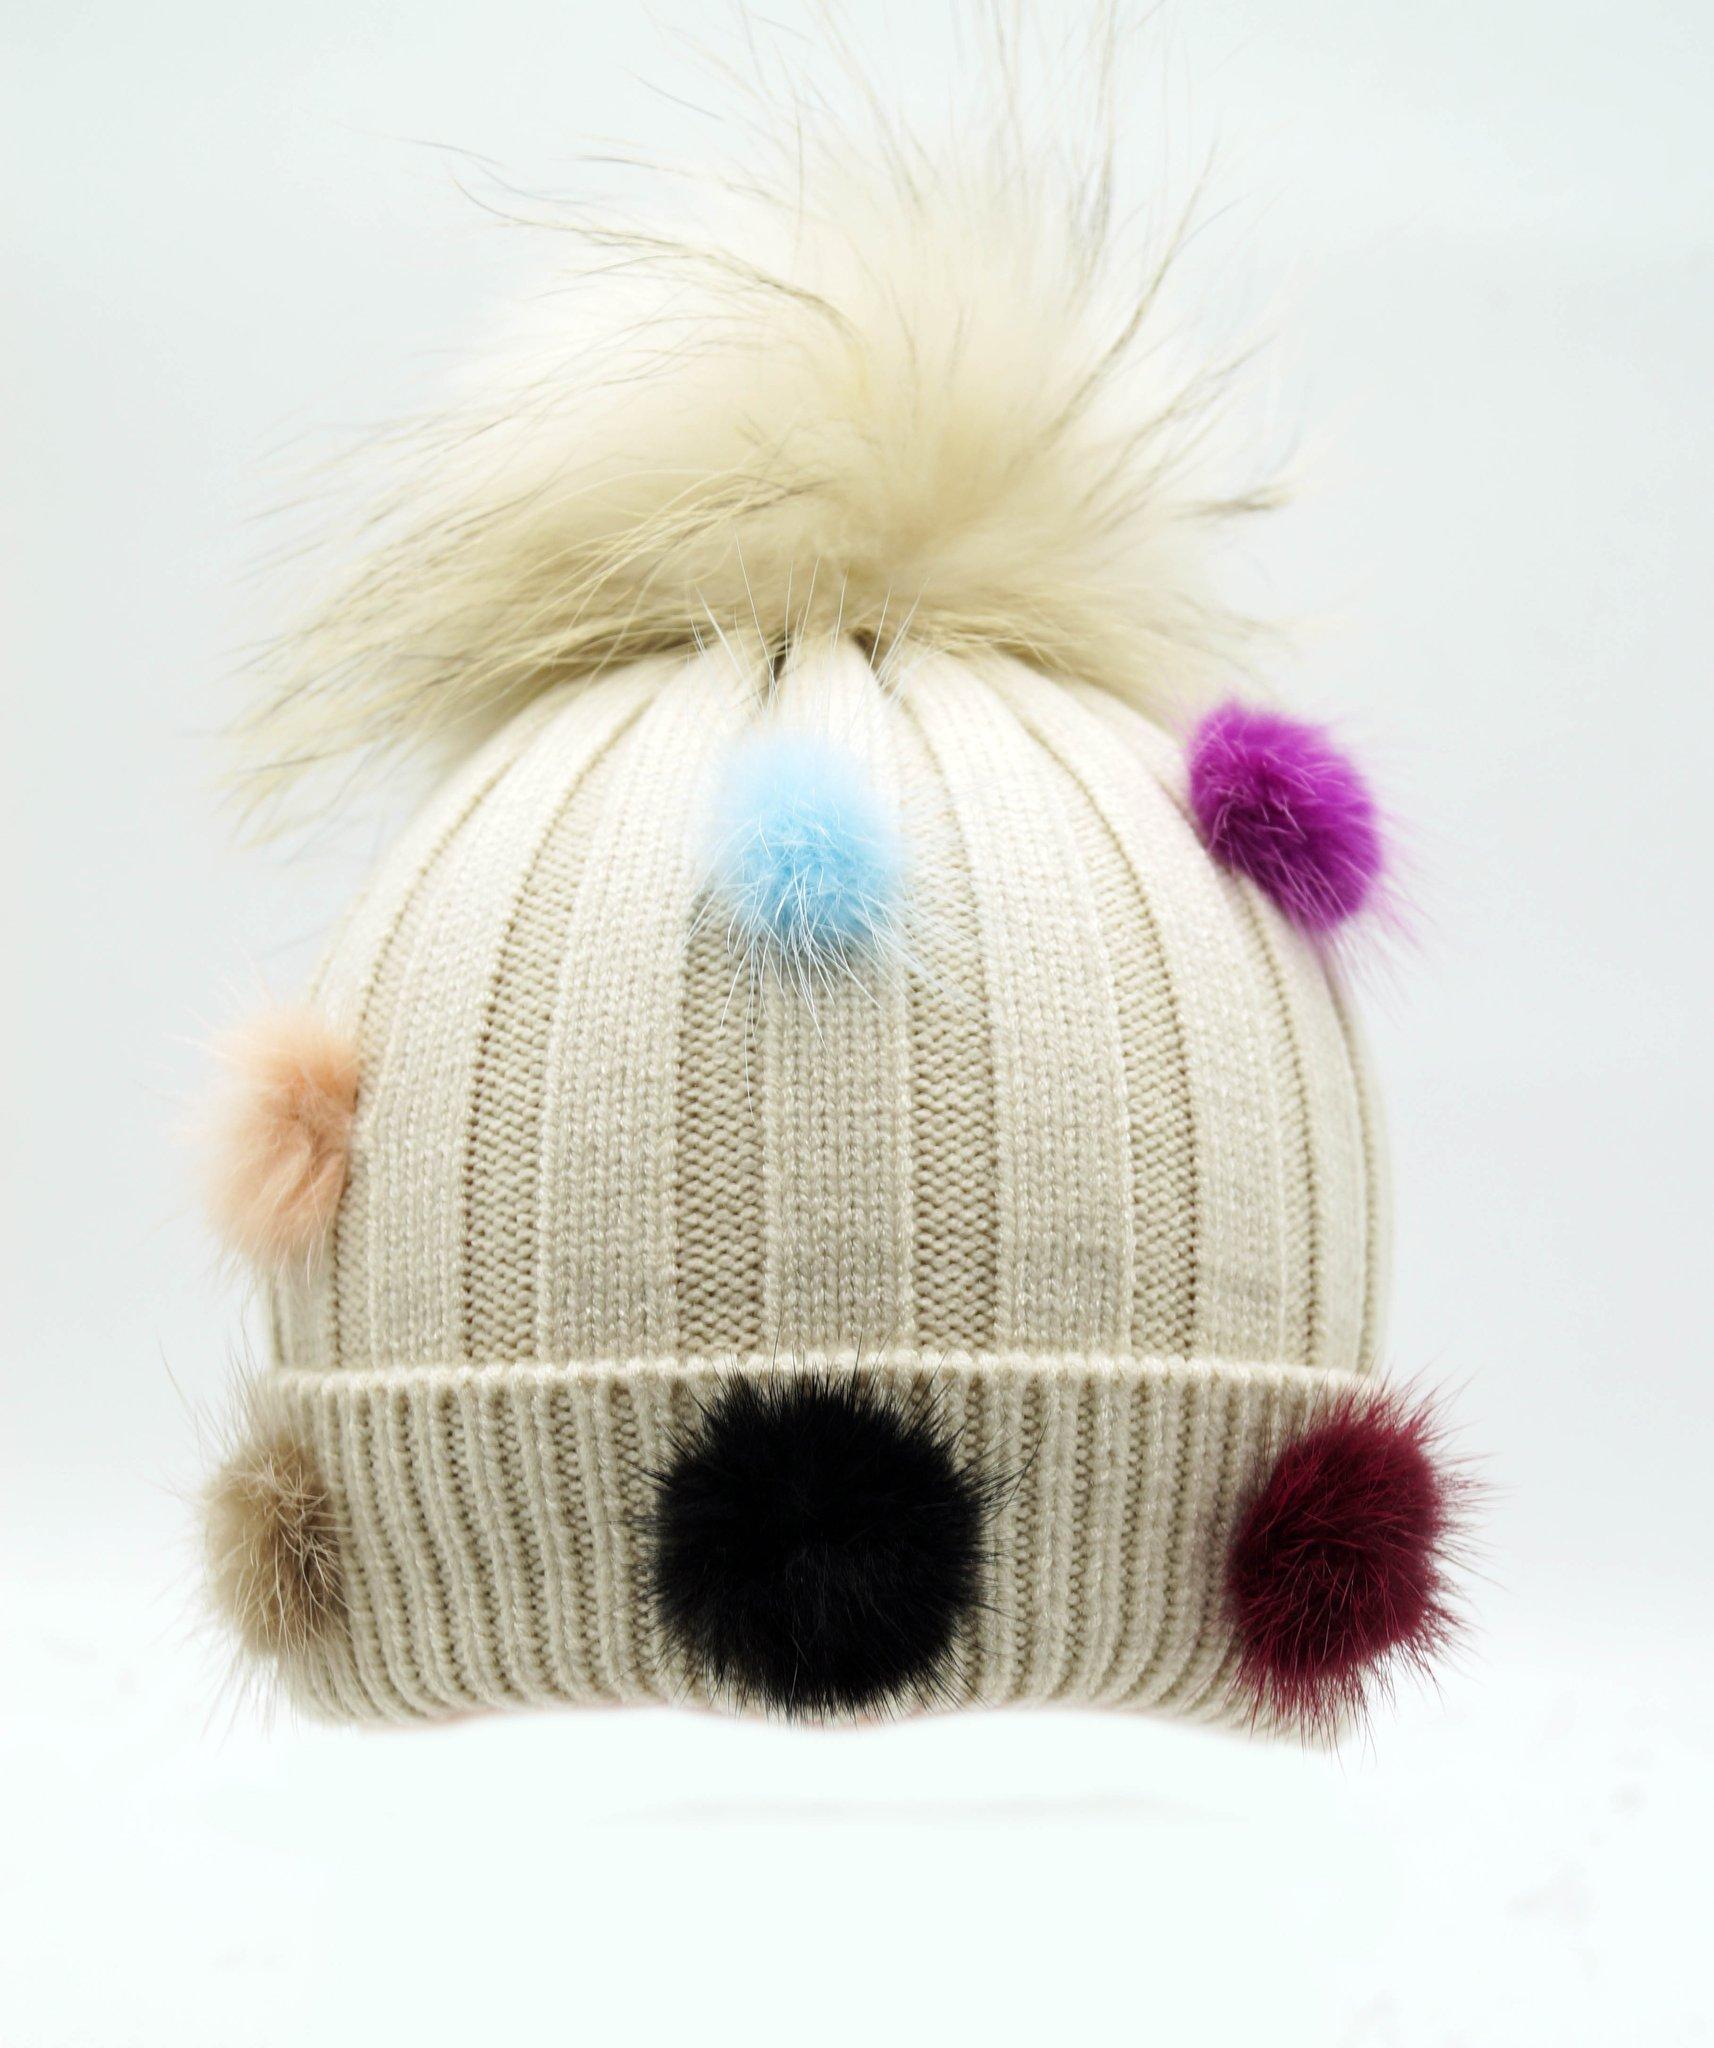 ef0b5237c Kids Beige Coloured Winter Hat Pom Poms Bobbles Toddlers All Sizes ...